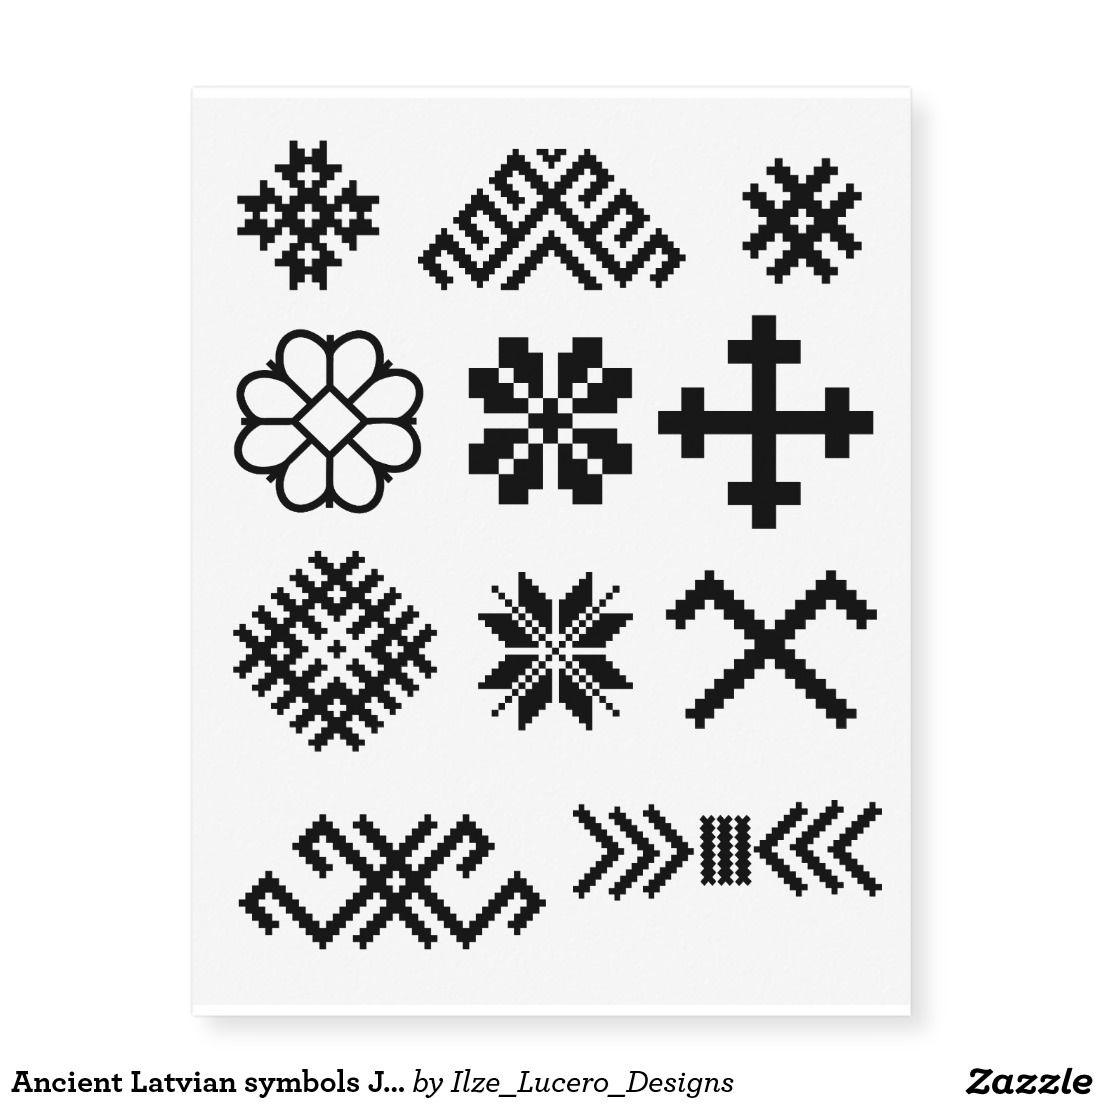 ancient latvian symbols jumis star cross star temporary tattoos. Black Bedroom Furniture Sets. Home Design Ideas